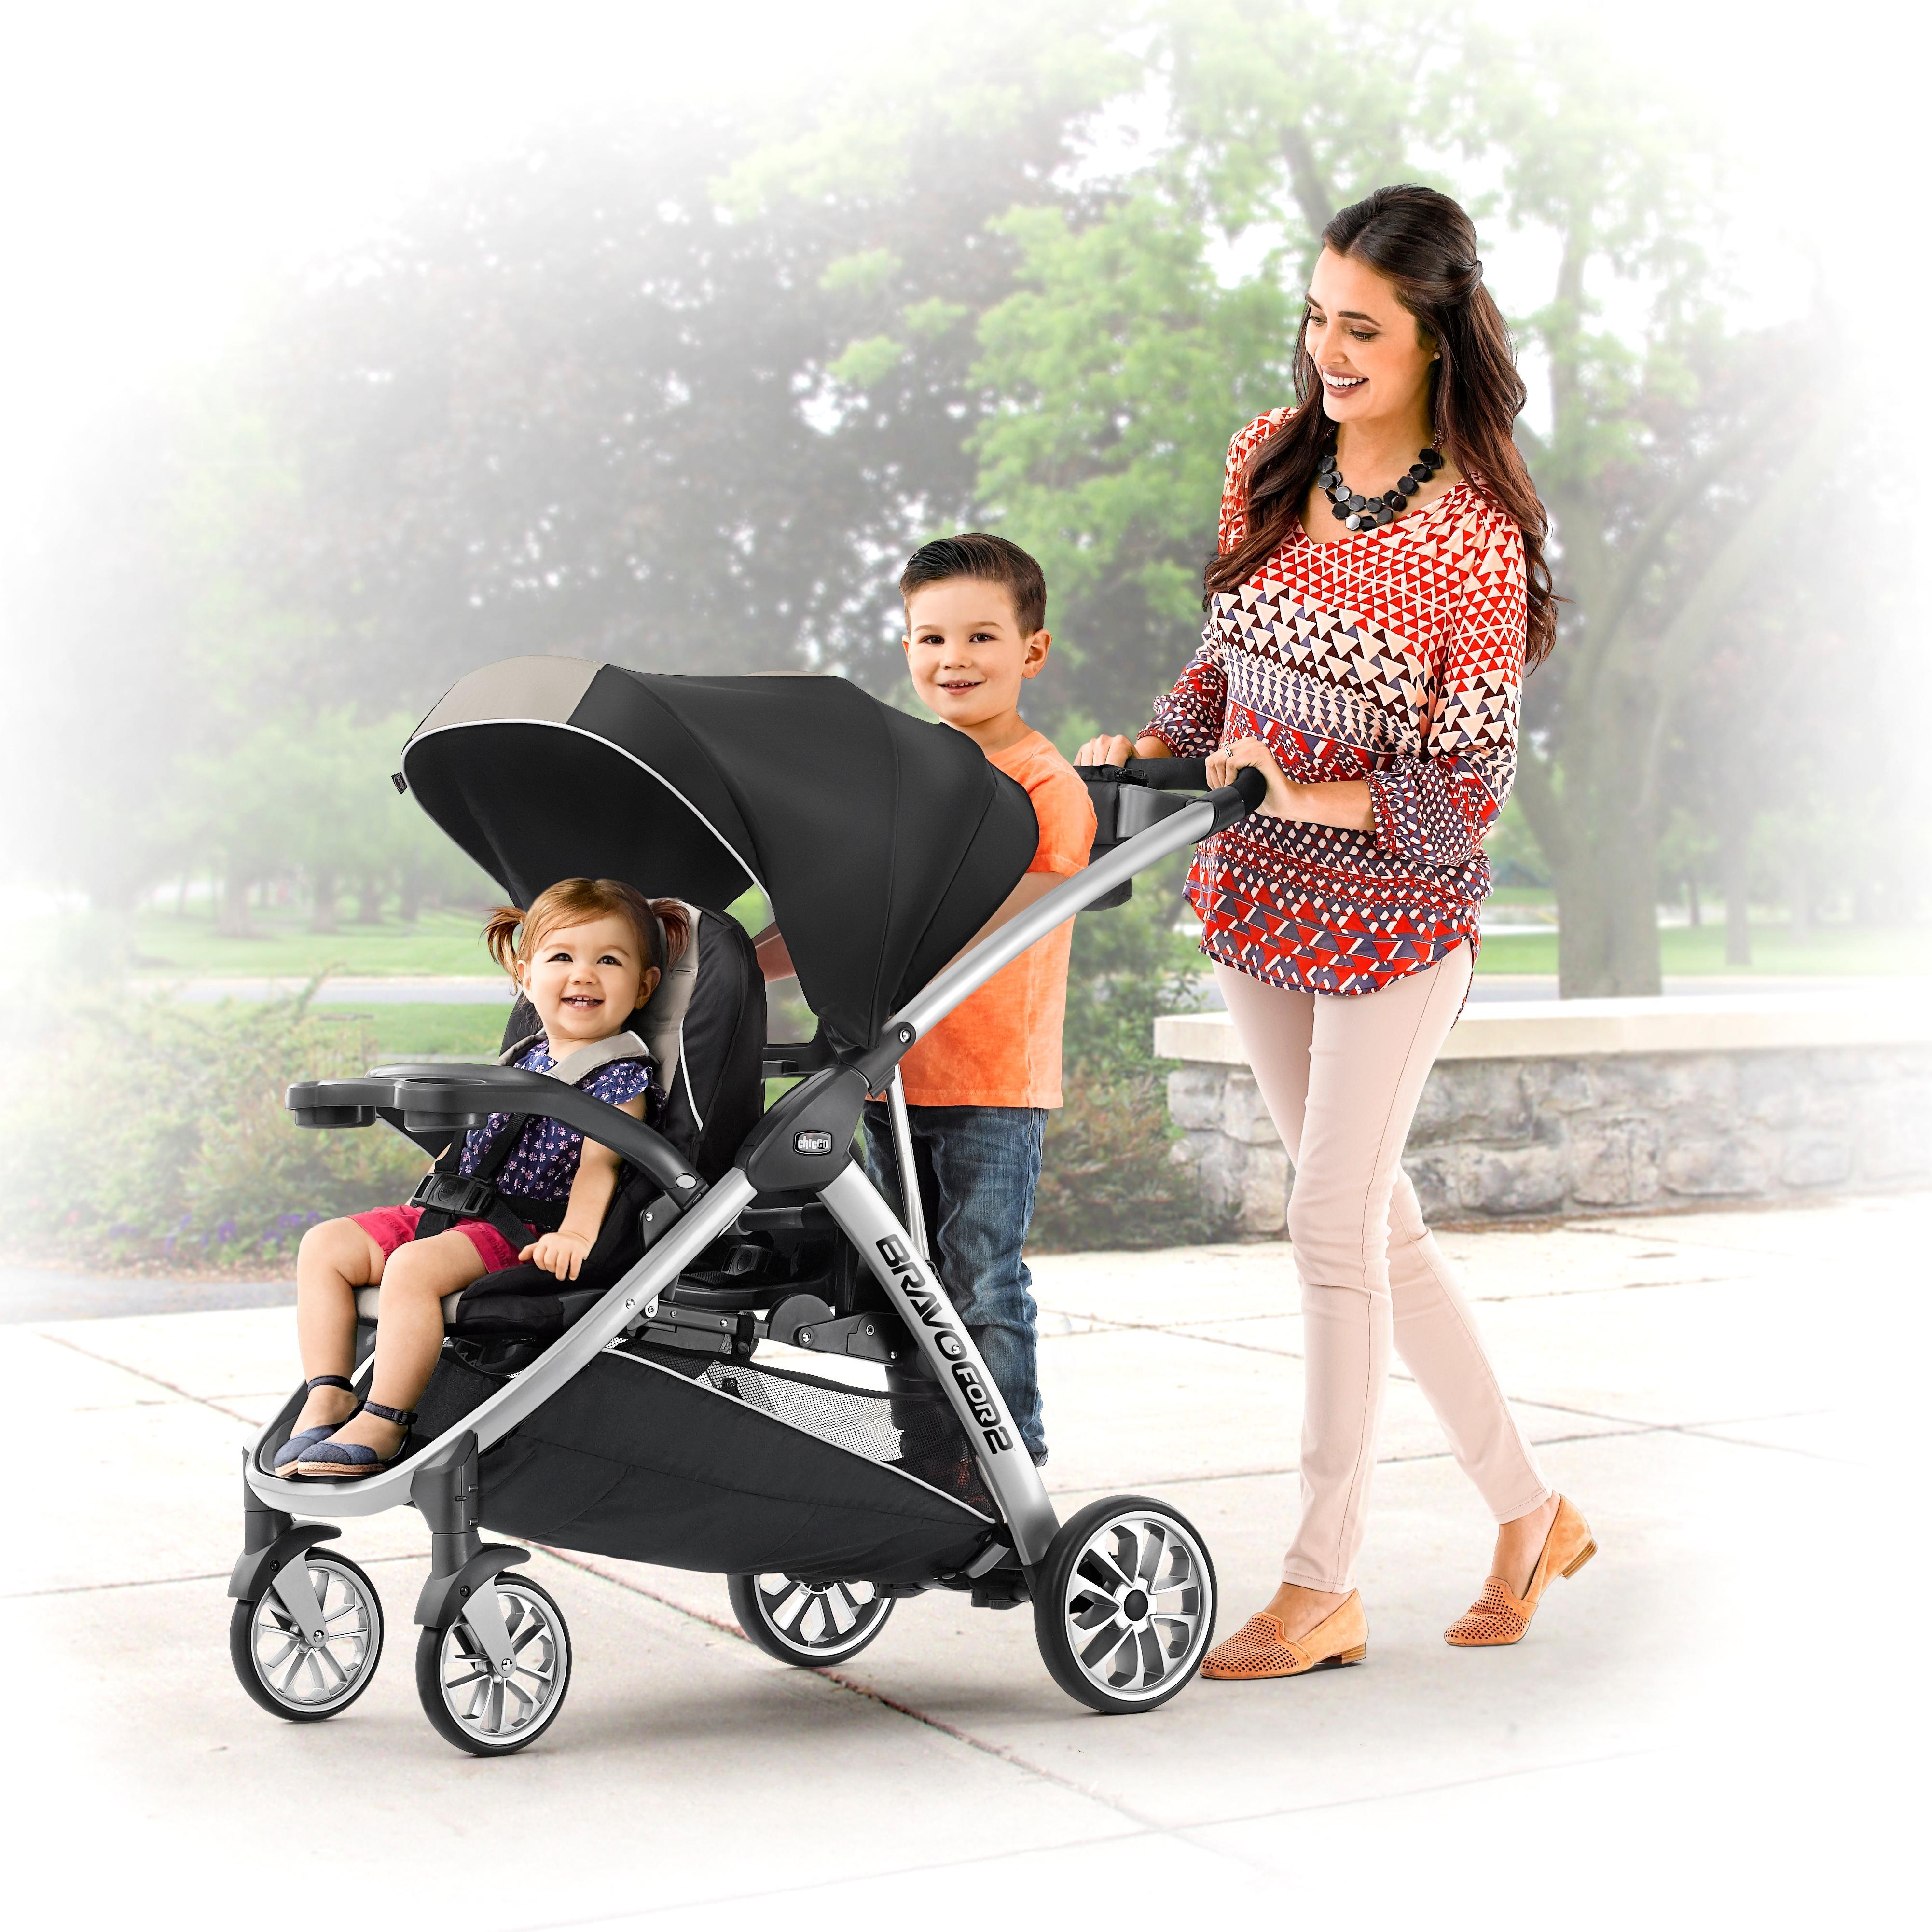 Amazon Com Bravofor2 2 Passenger Double Stroller Zinc Baby